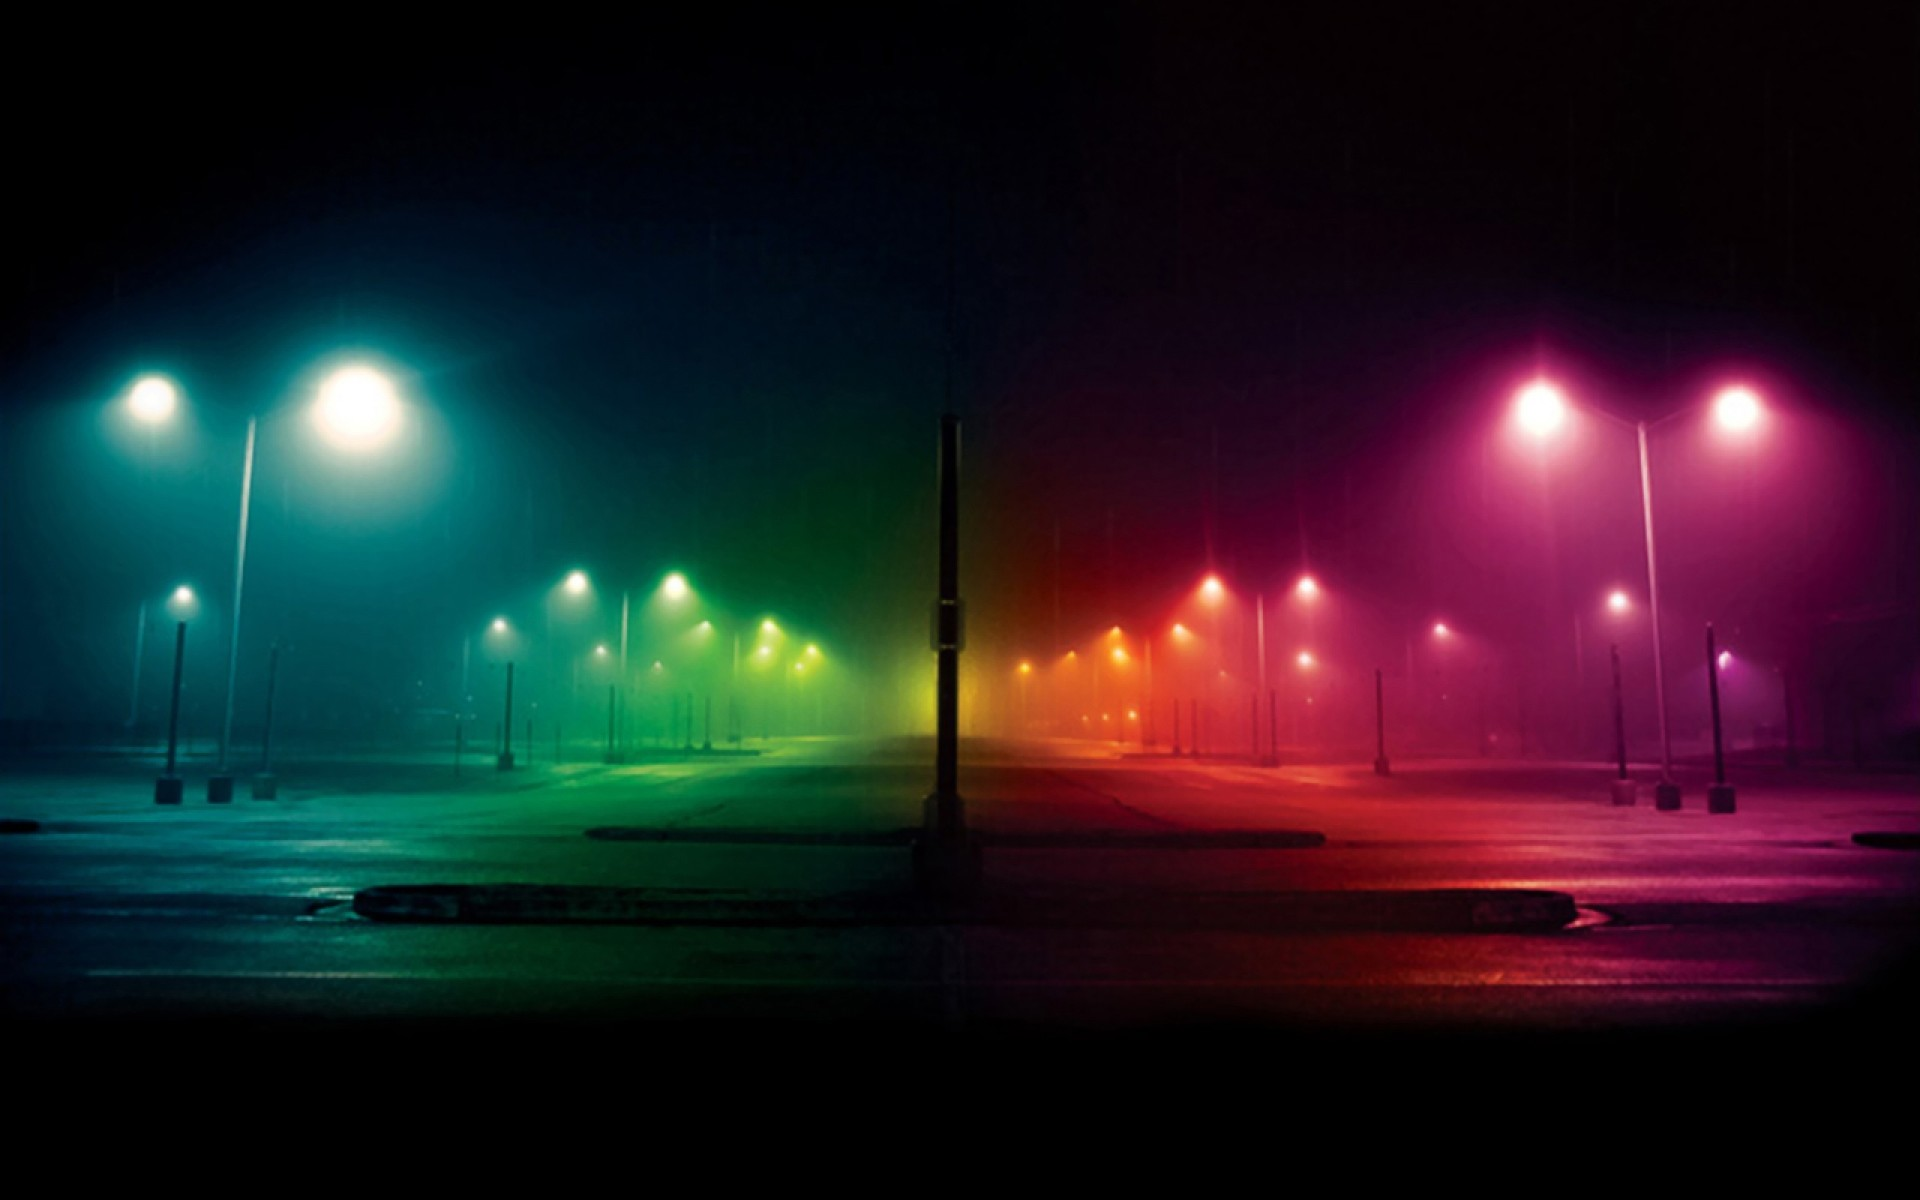 City Lights Wallpaper Widescreen – Cedehm.com